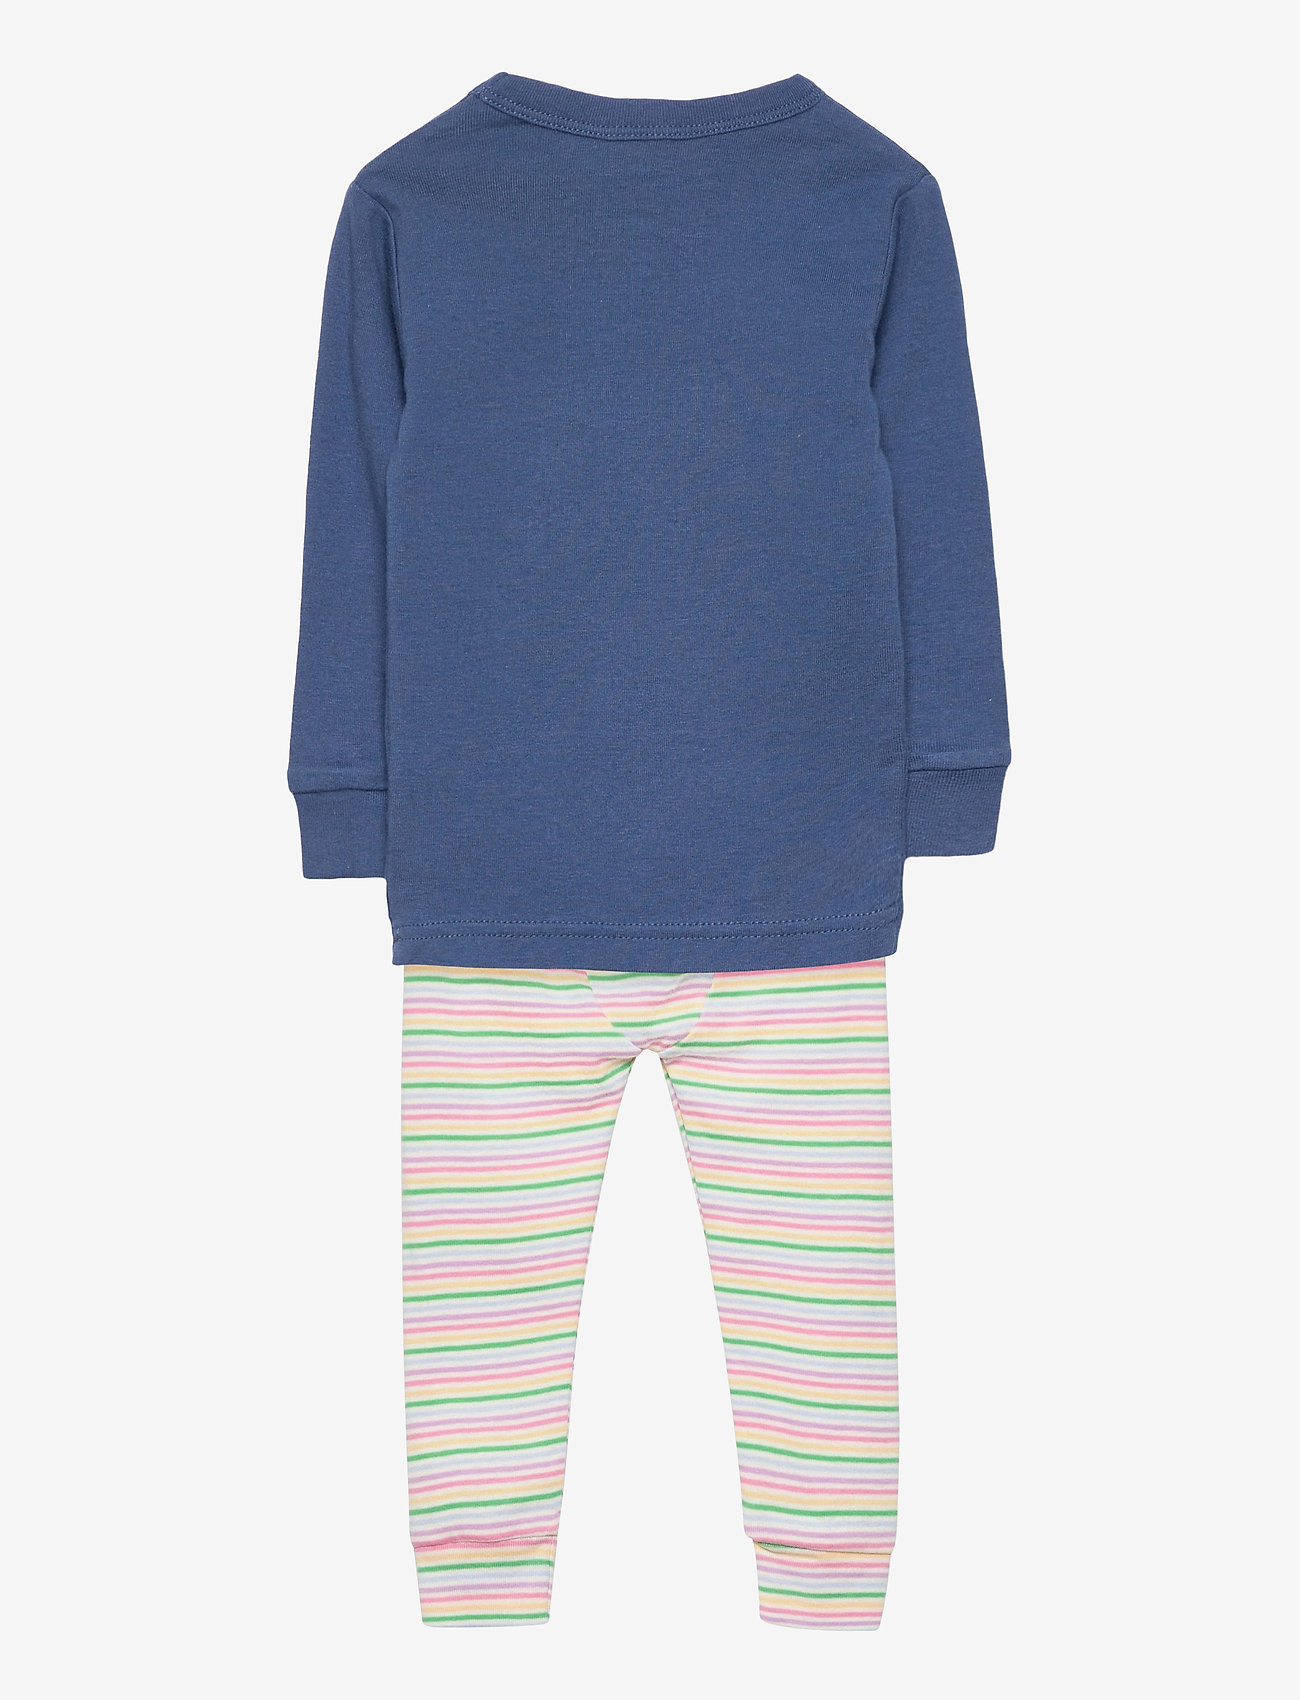 GAP - babyGap 100% Organic Cotton Be Kind Graphic PJ Set - 2-delte sæt - blue shade - 2